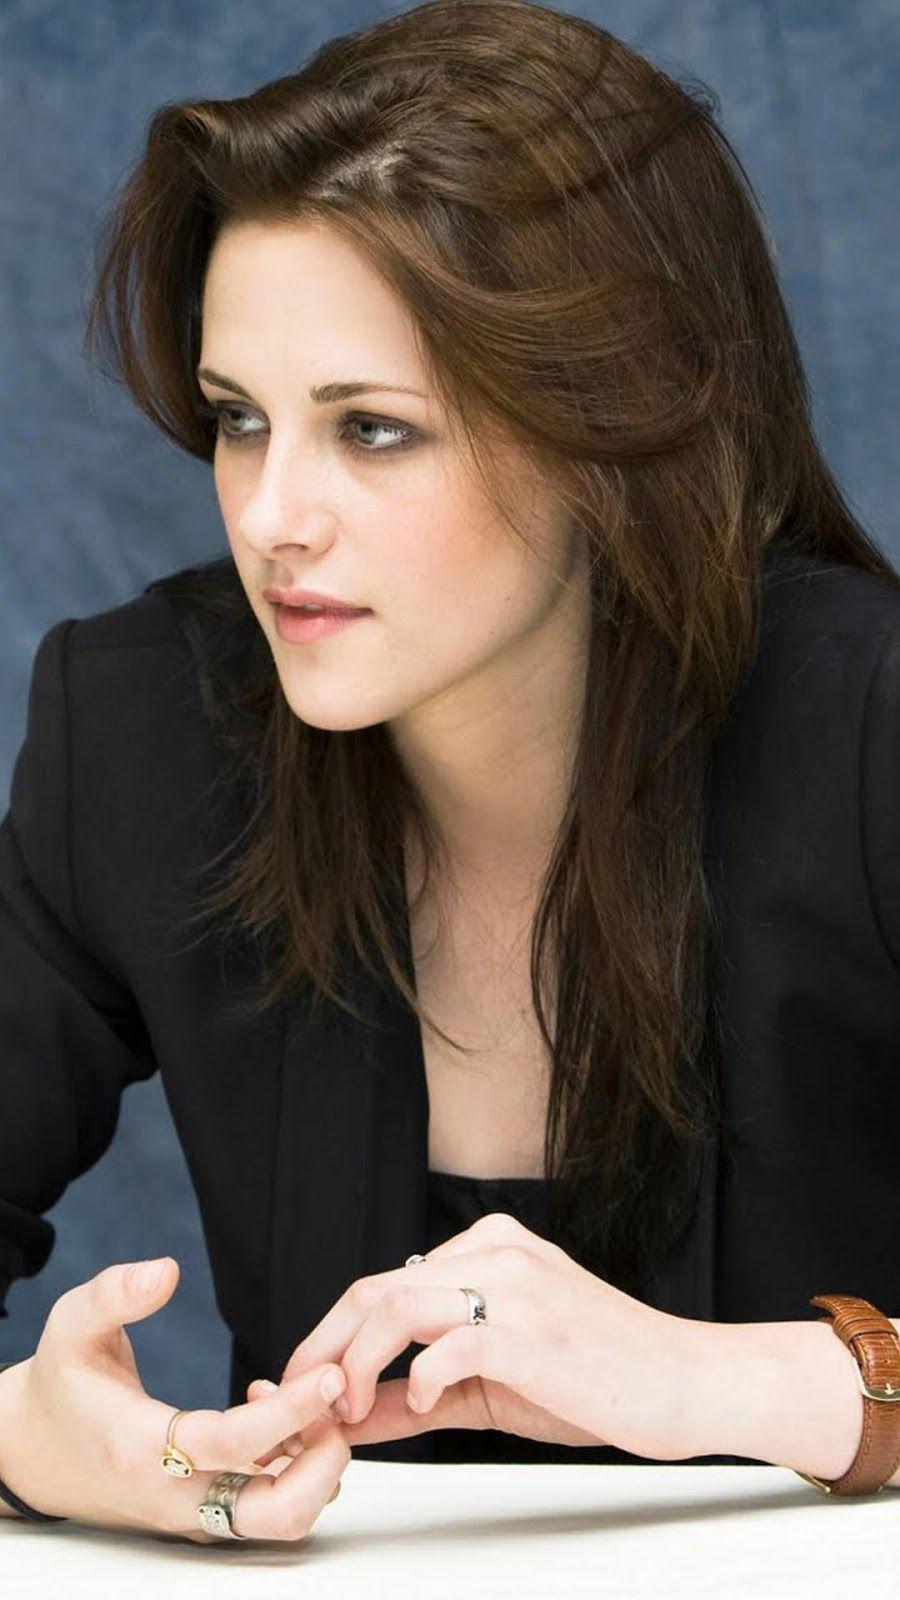 Kristen Stewart Mobile Hd Wallpaper Liked Pinterest Wallpaper